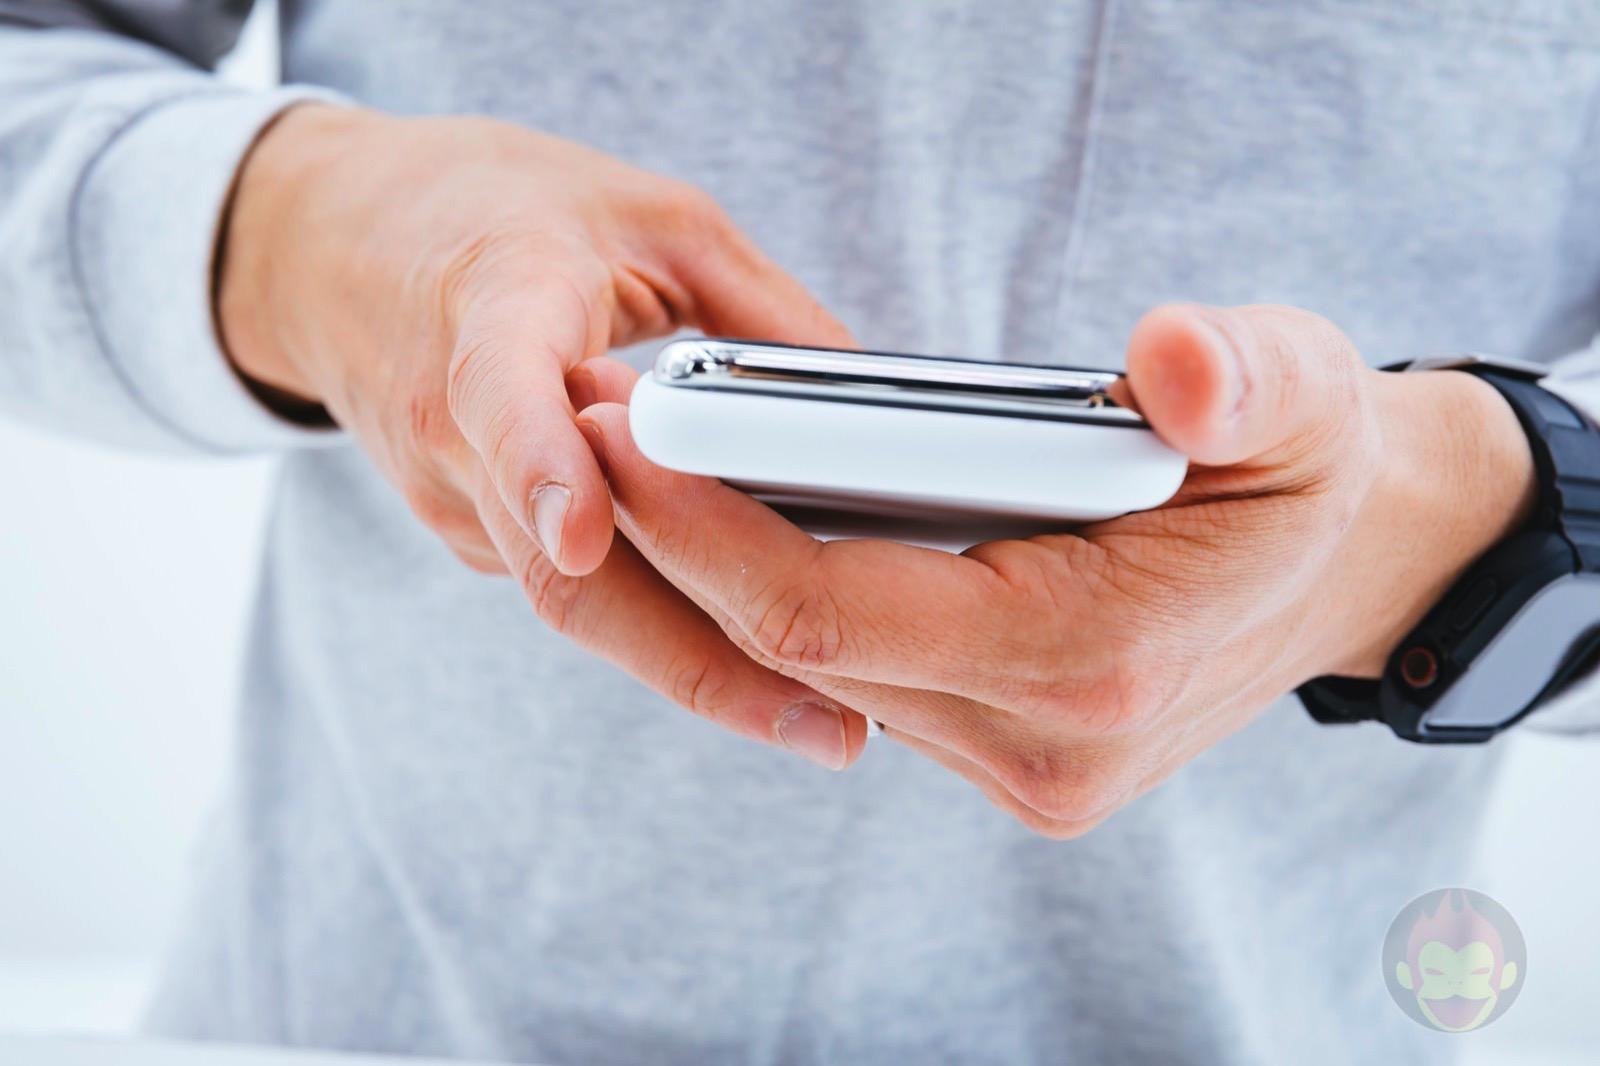 Smart-Battery-Case-for-iPhoneXS-Review-23.jpg